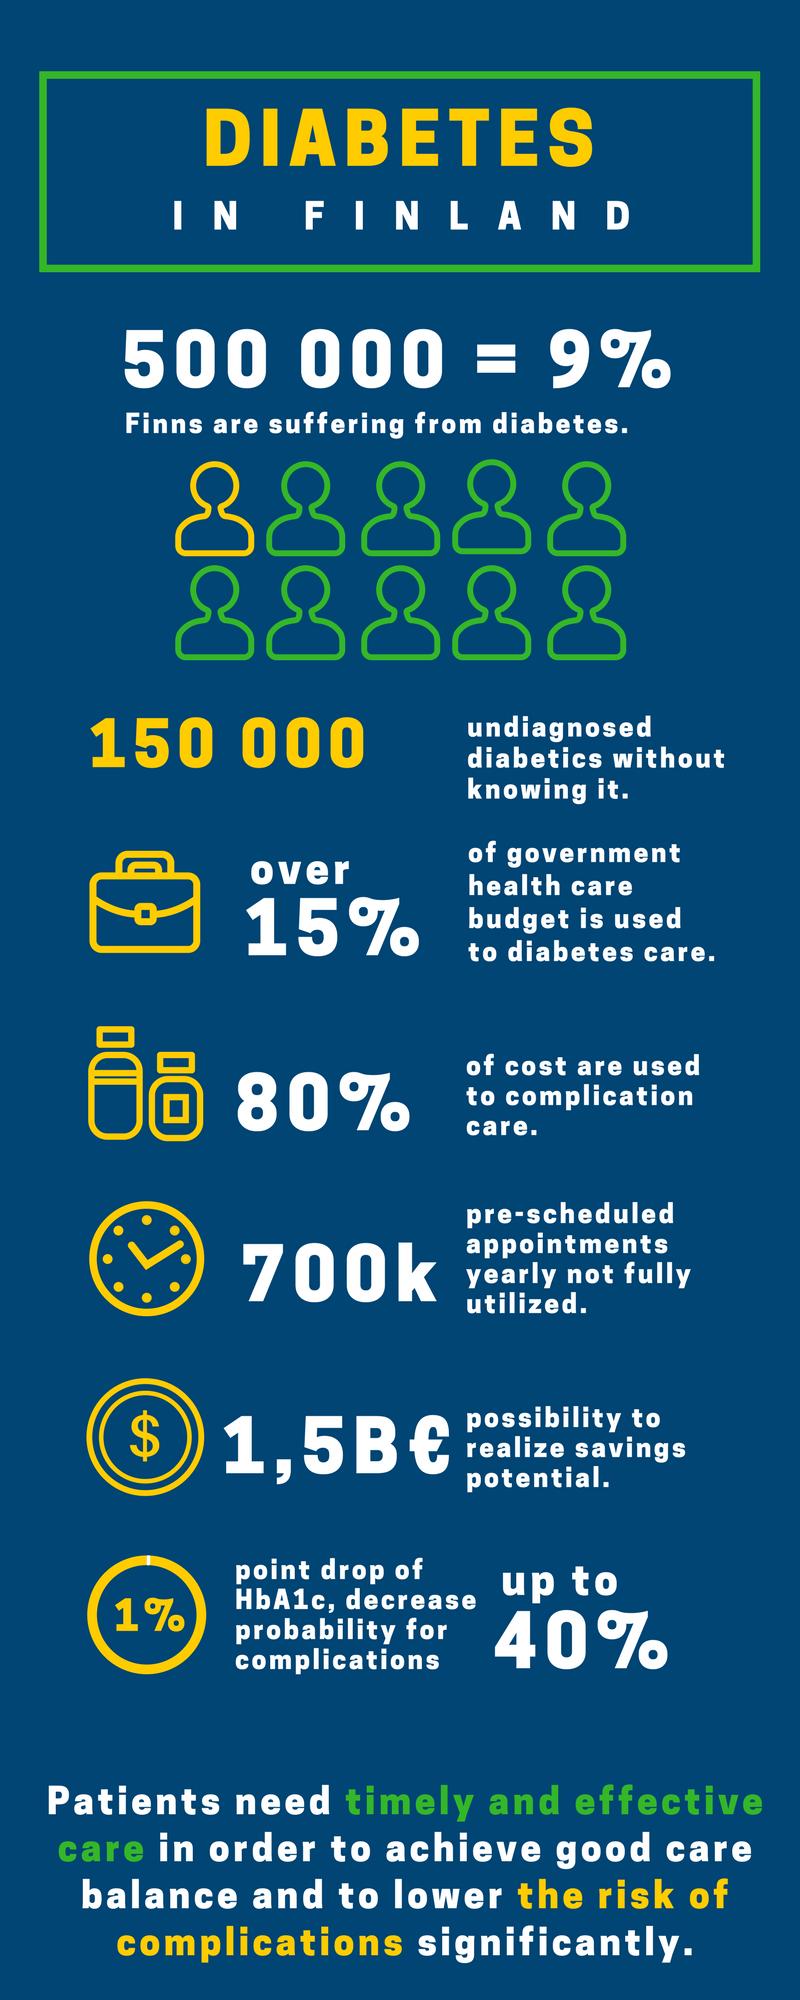 Diabetes in Finland